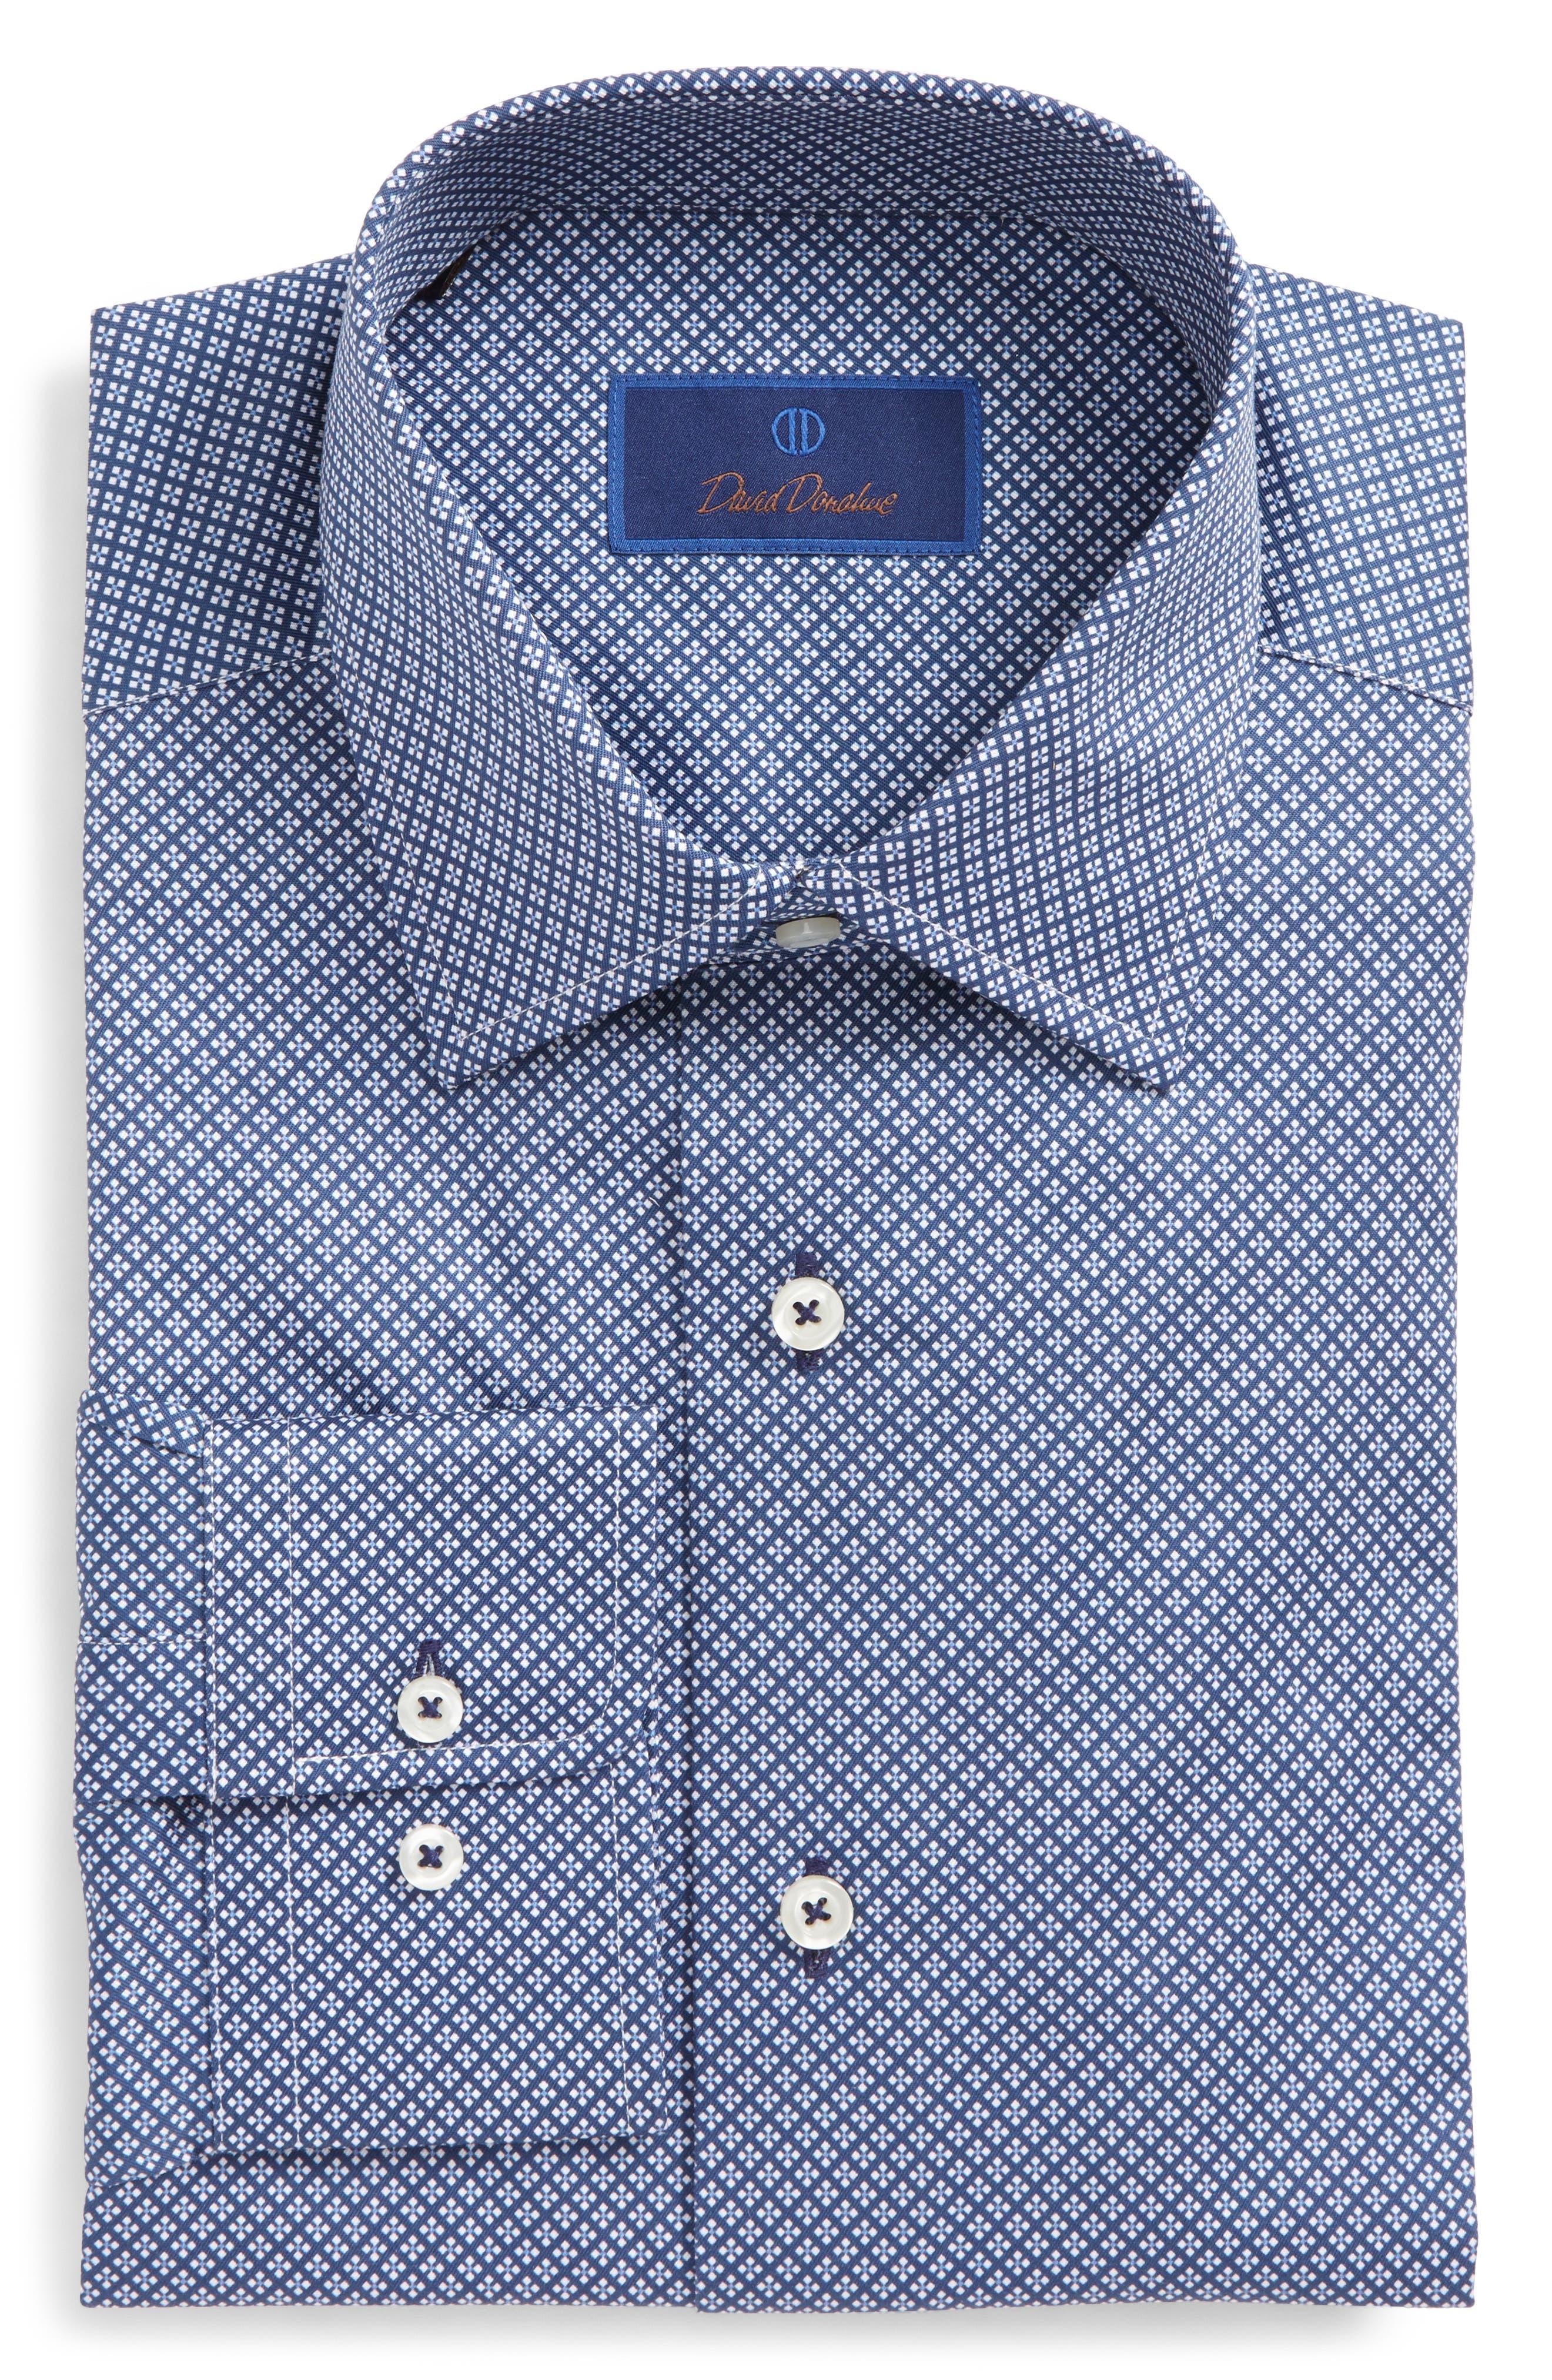 David Donahue Regular Fit Geometric Dress Shirt